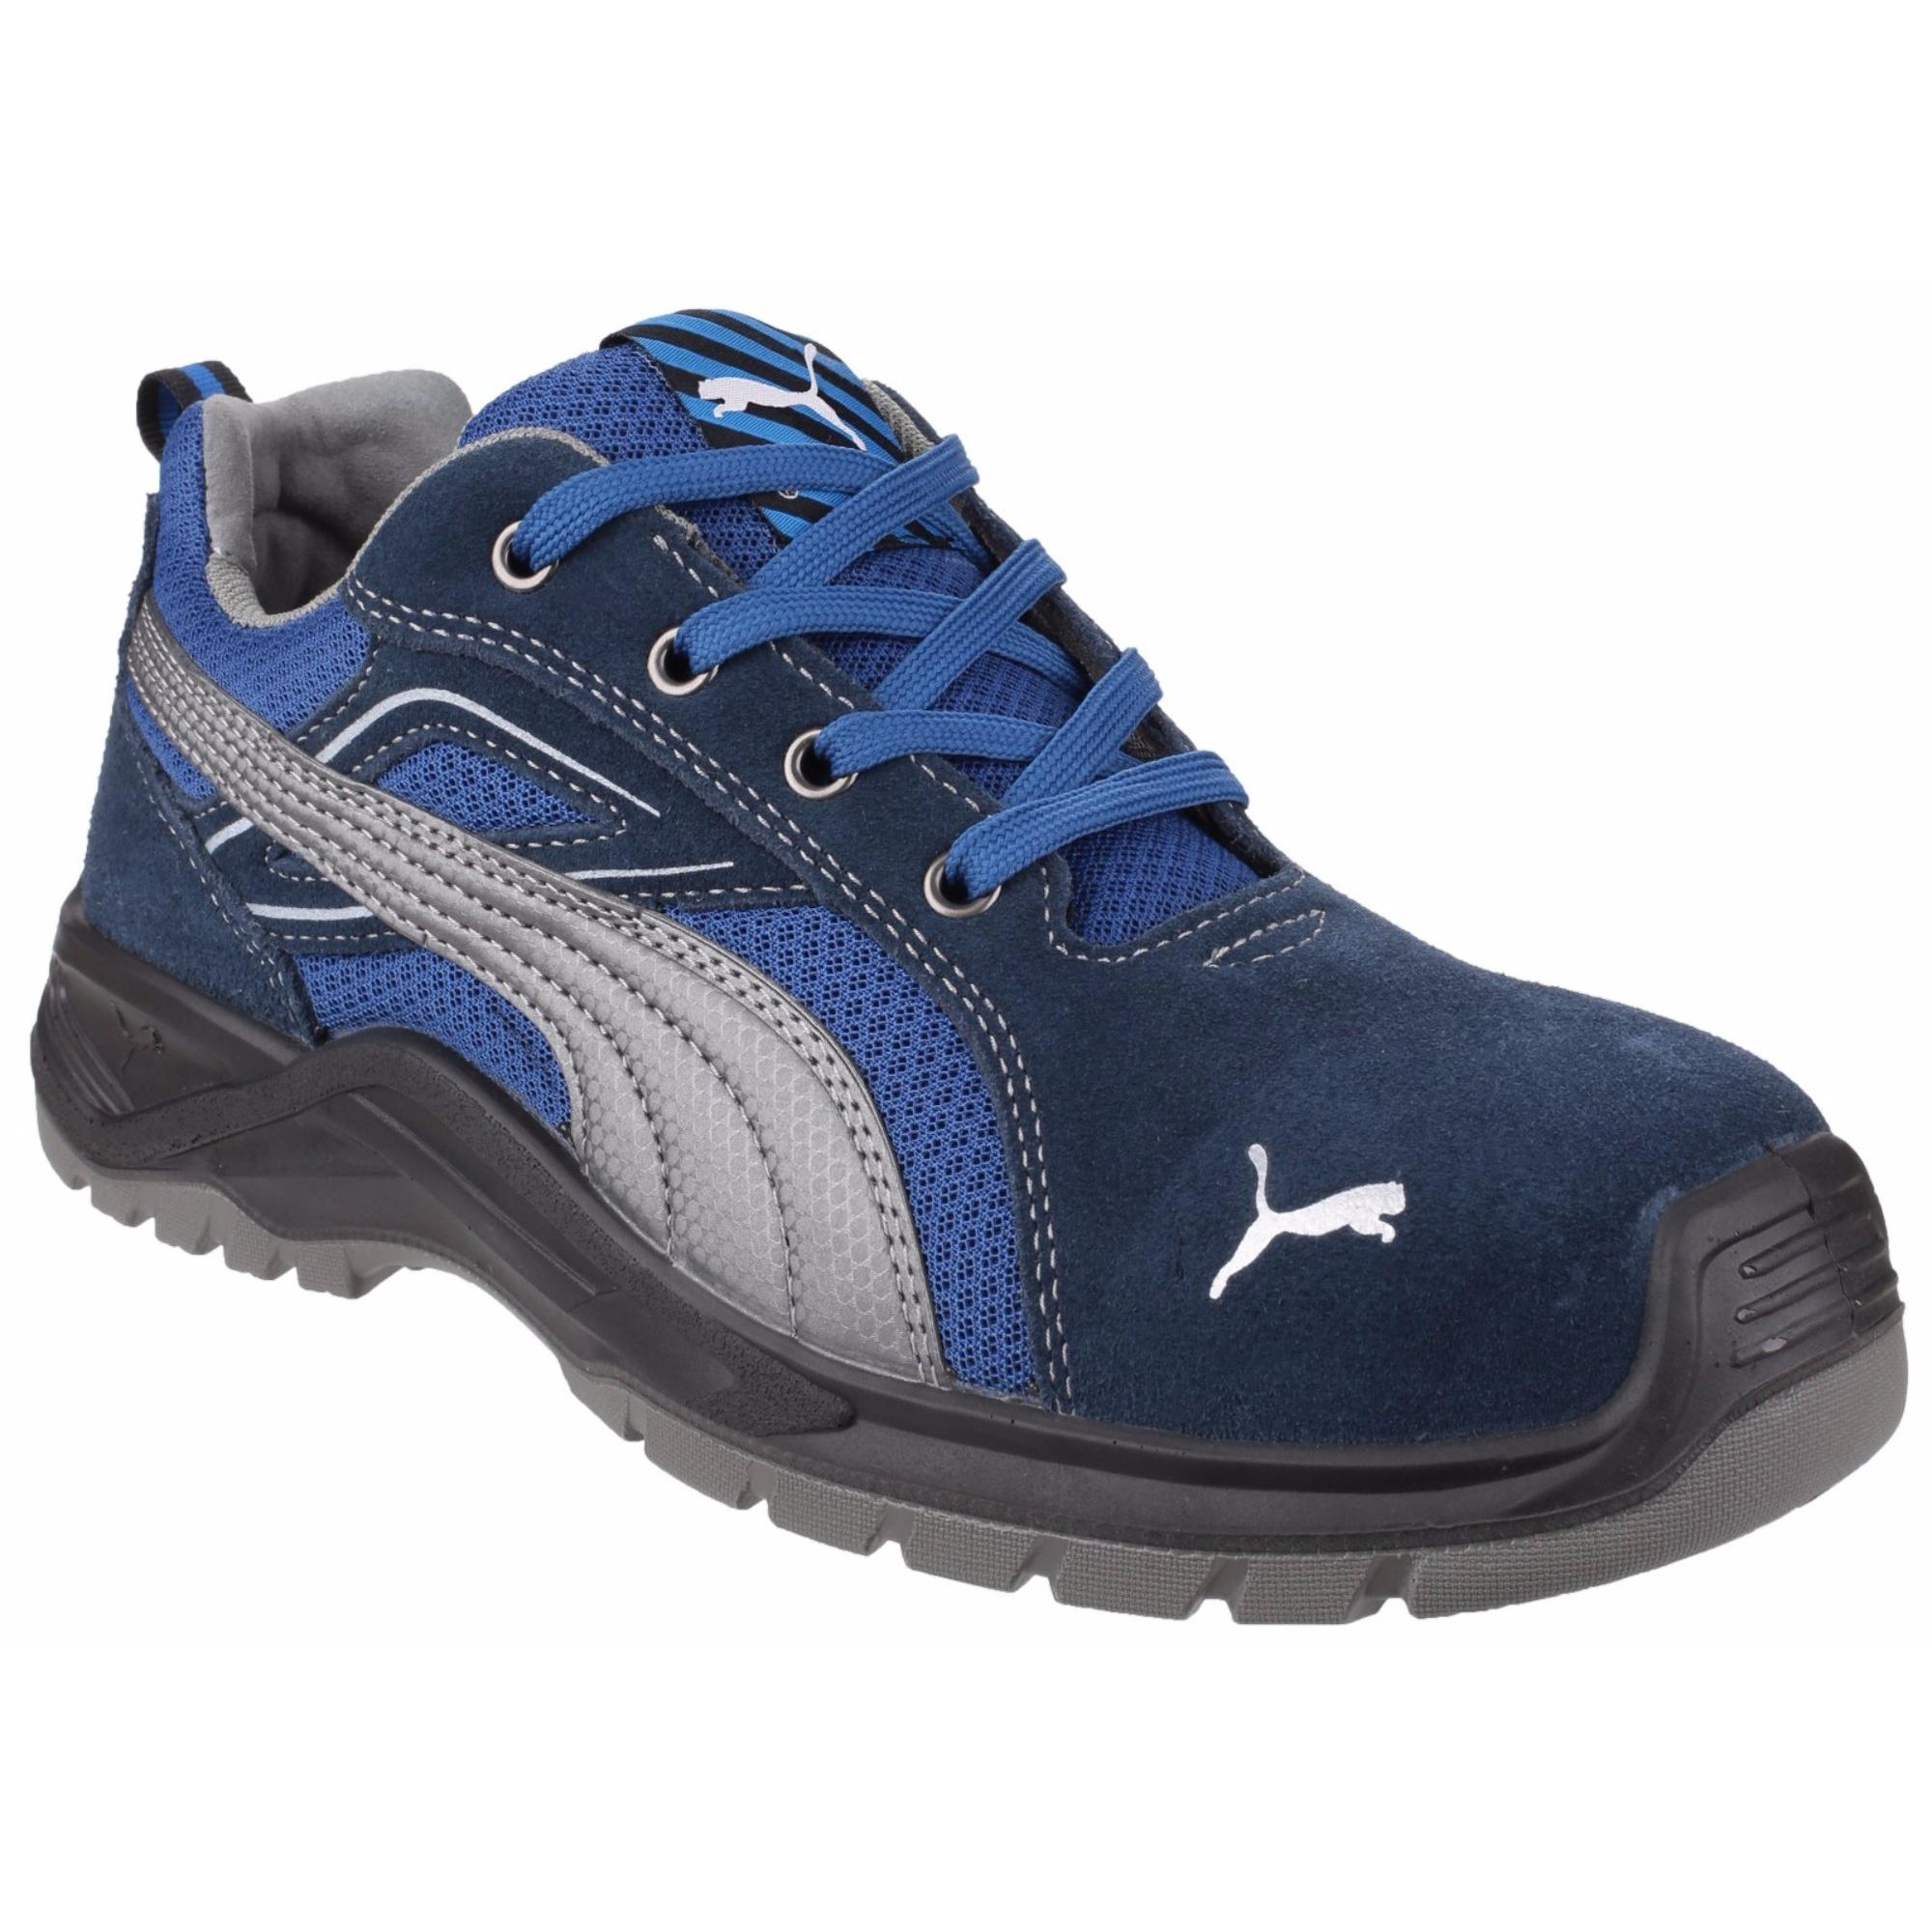 calzado de seguridad puma para hombre